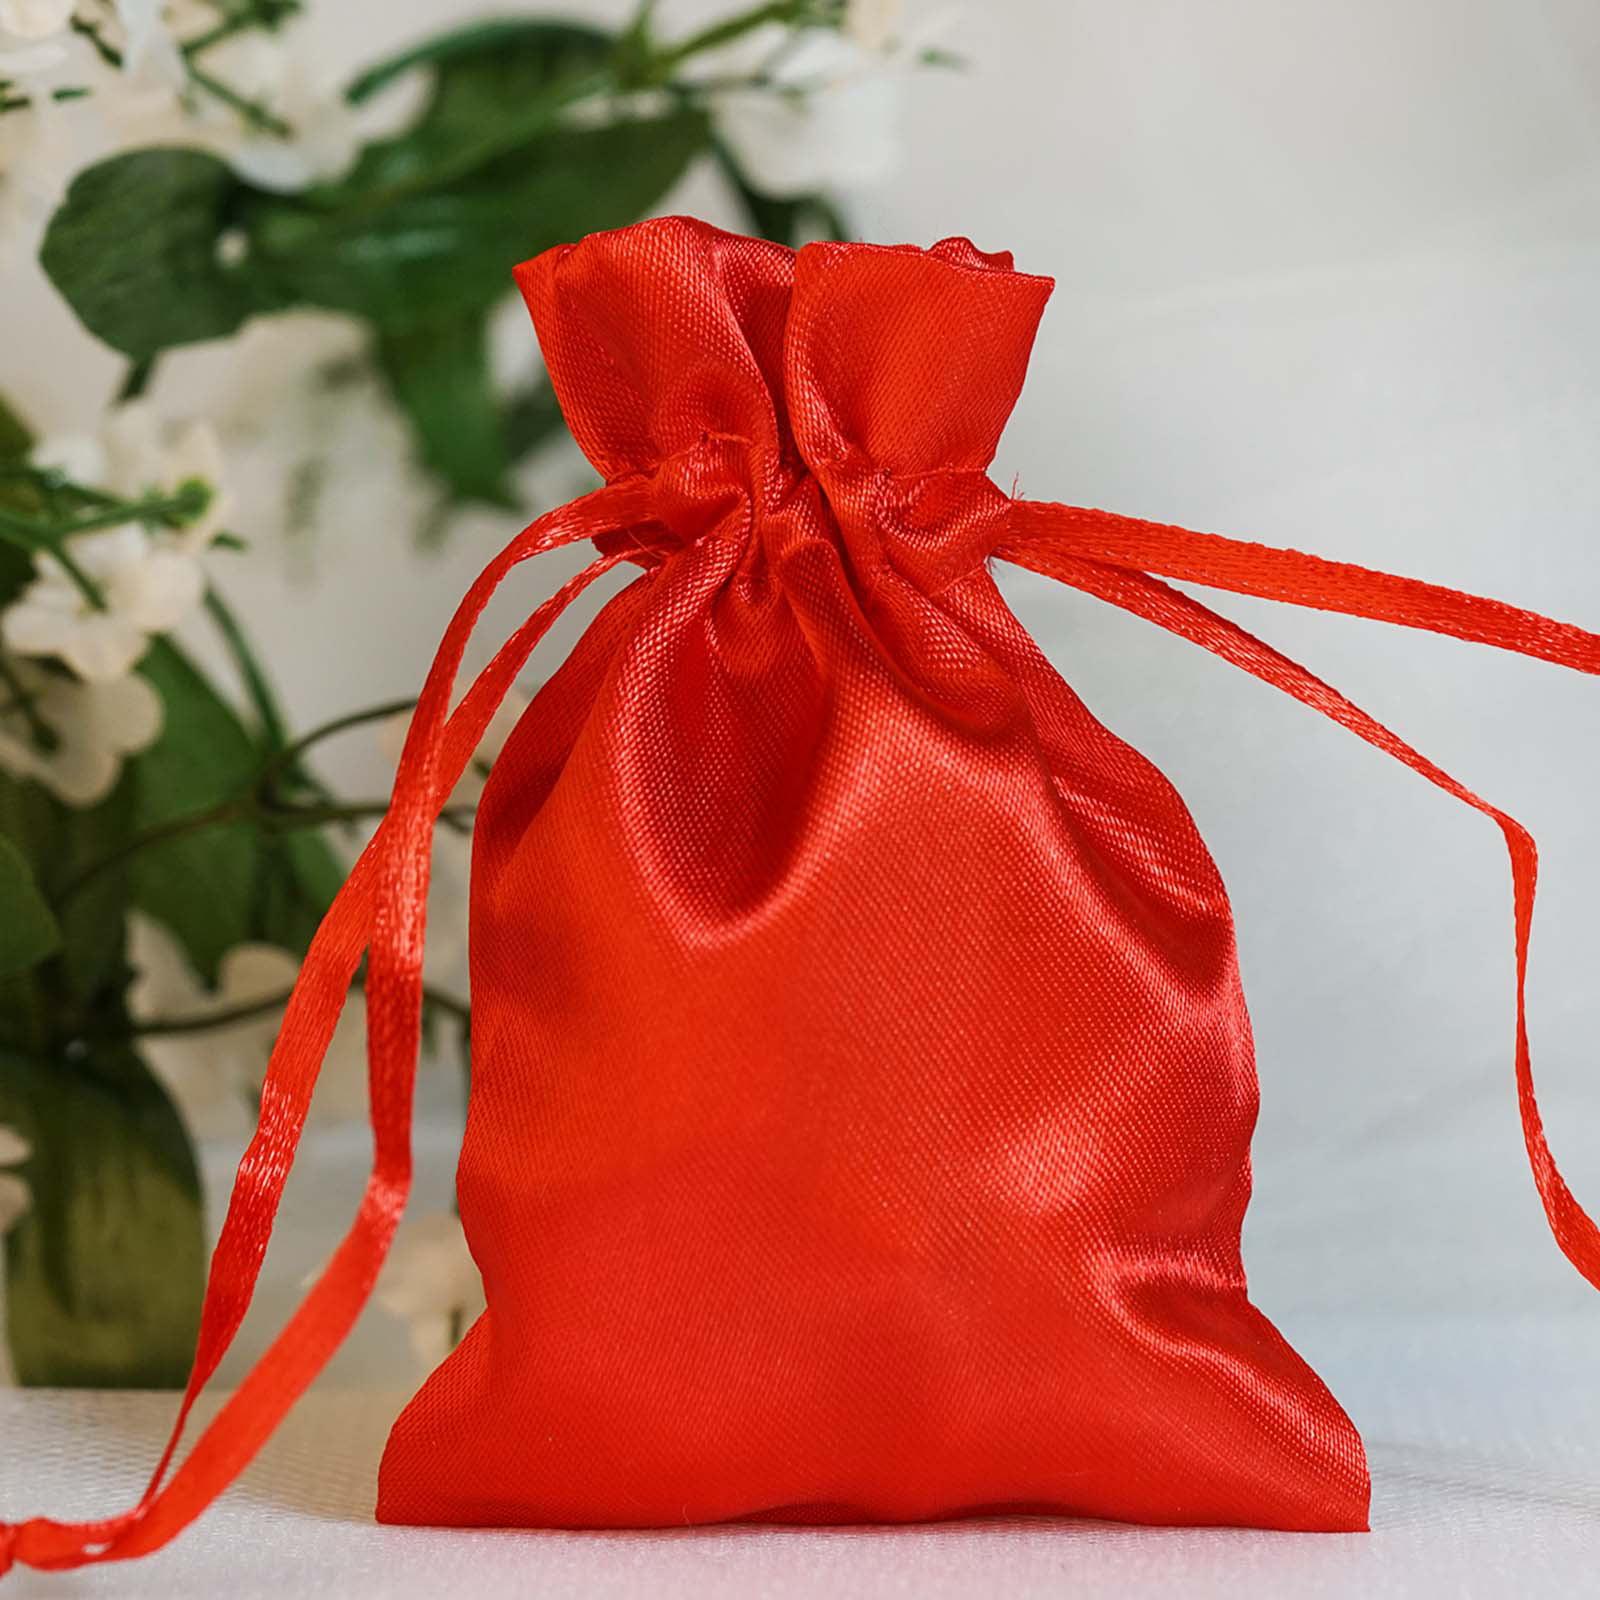 Metallic Rainbow Tree Wedding Party Rainbow Organza Sheer Drawstring Jewelry Gift Pouch Treat Bag Christmas Birthday Favor Gift Bag